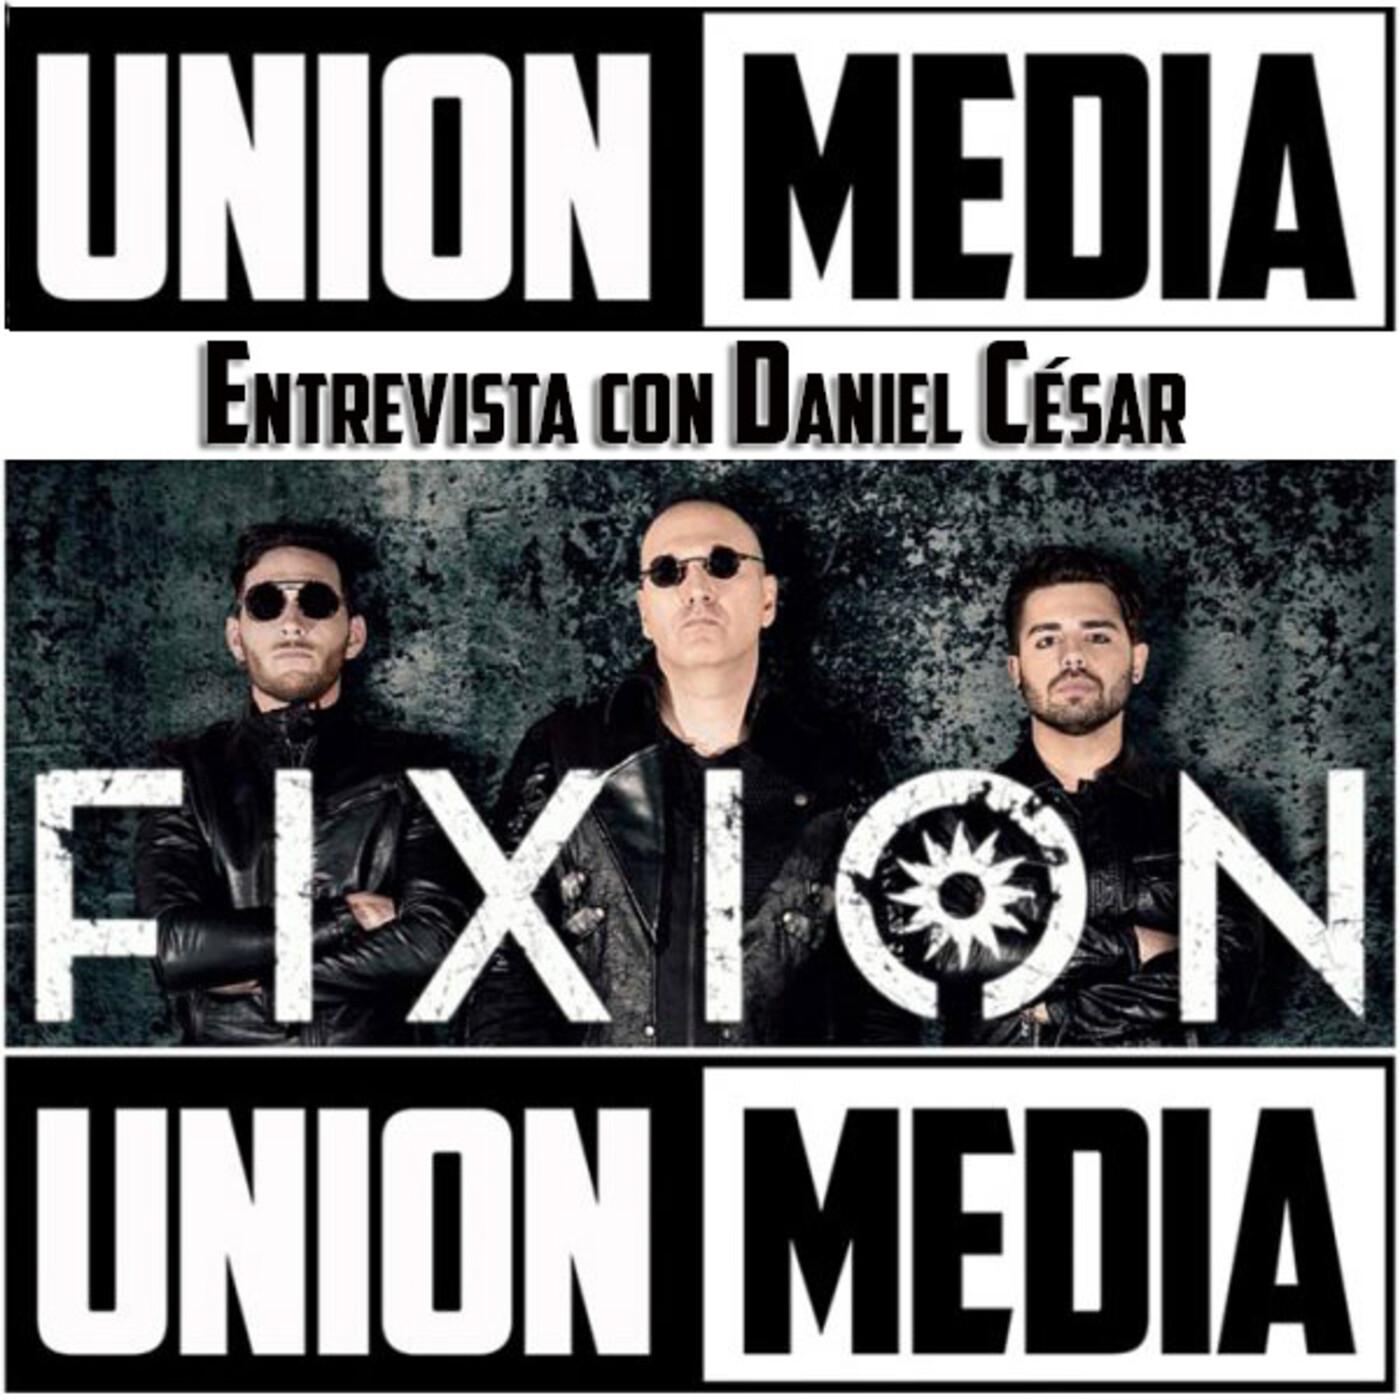 Entrevista con Daniel César, alma máter de FIXION